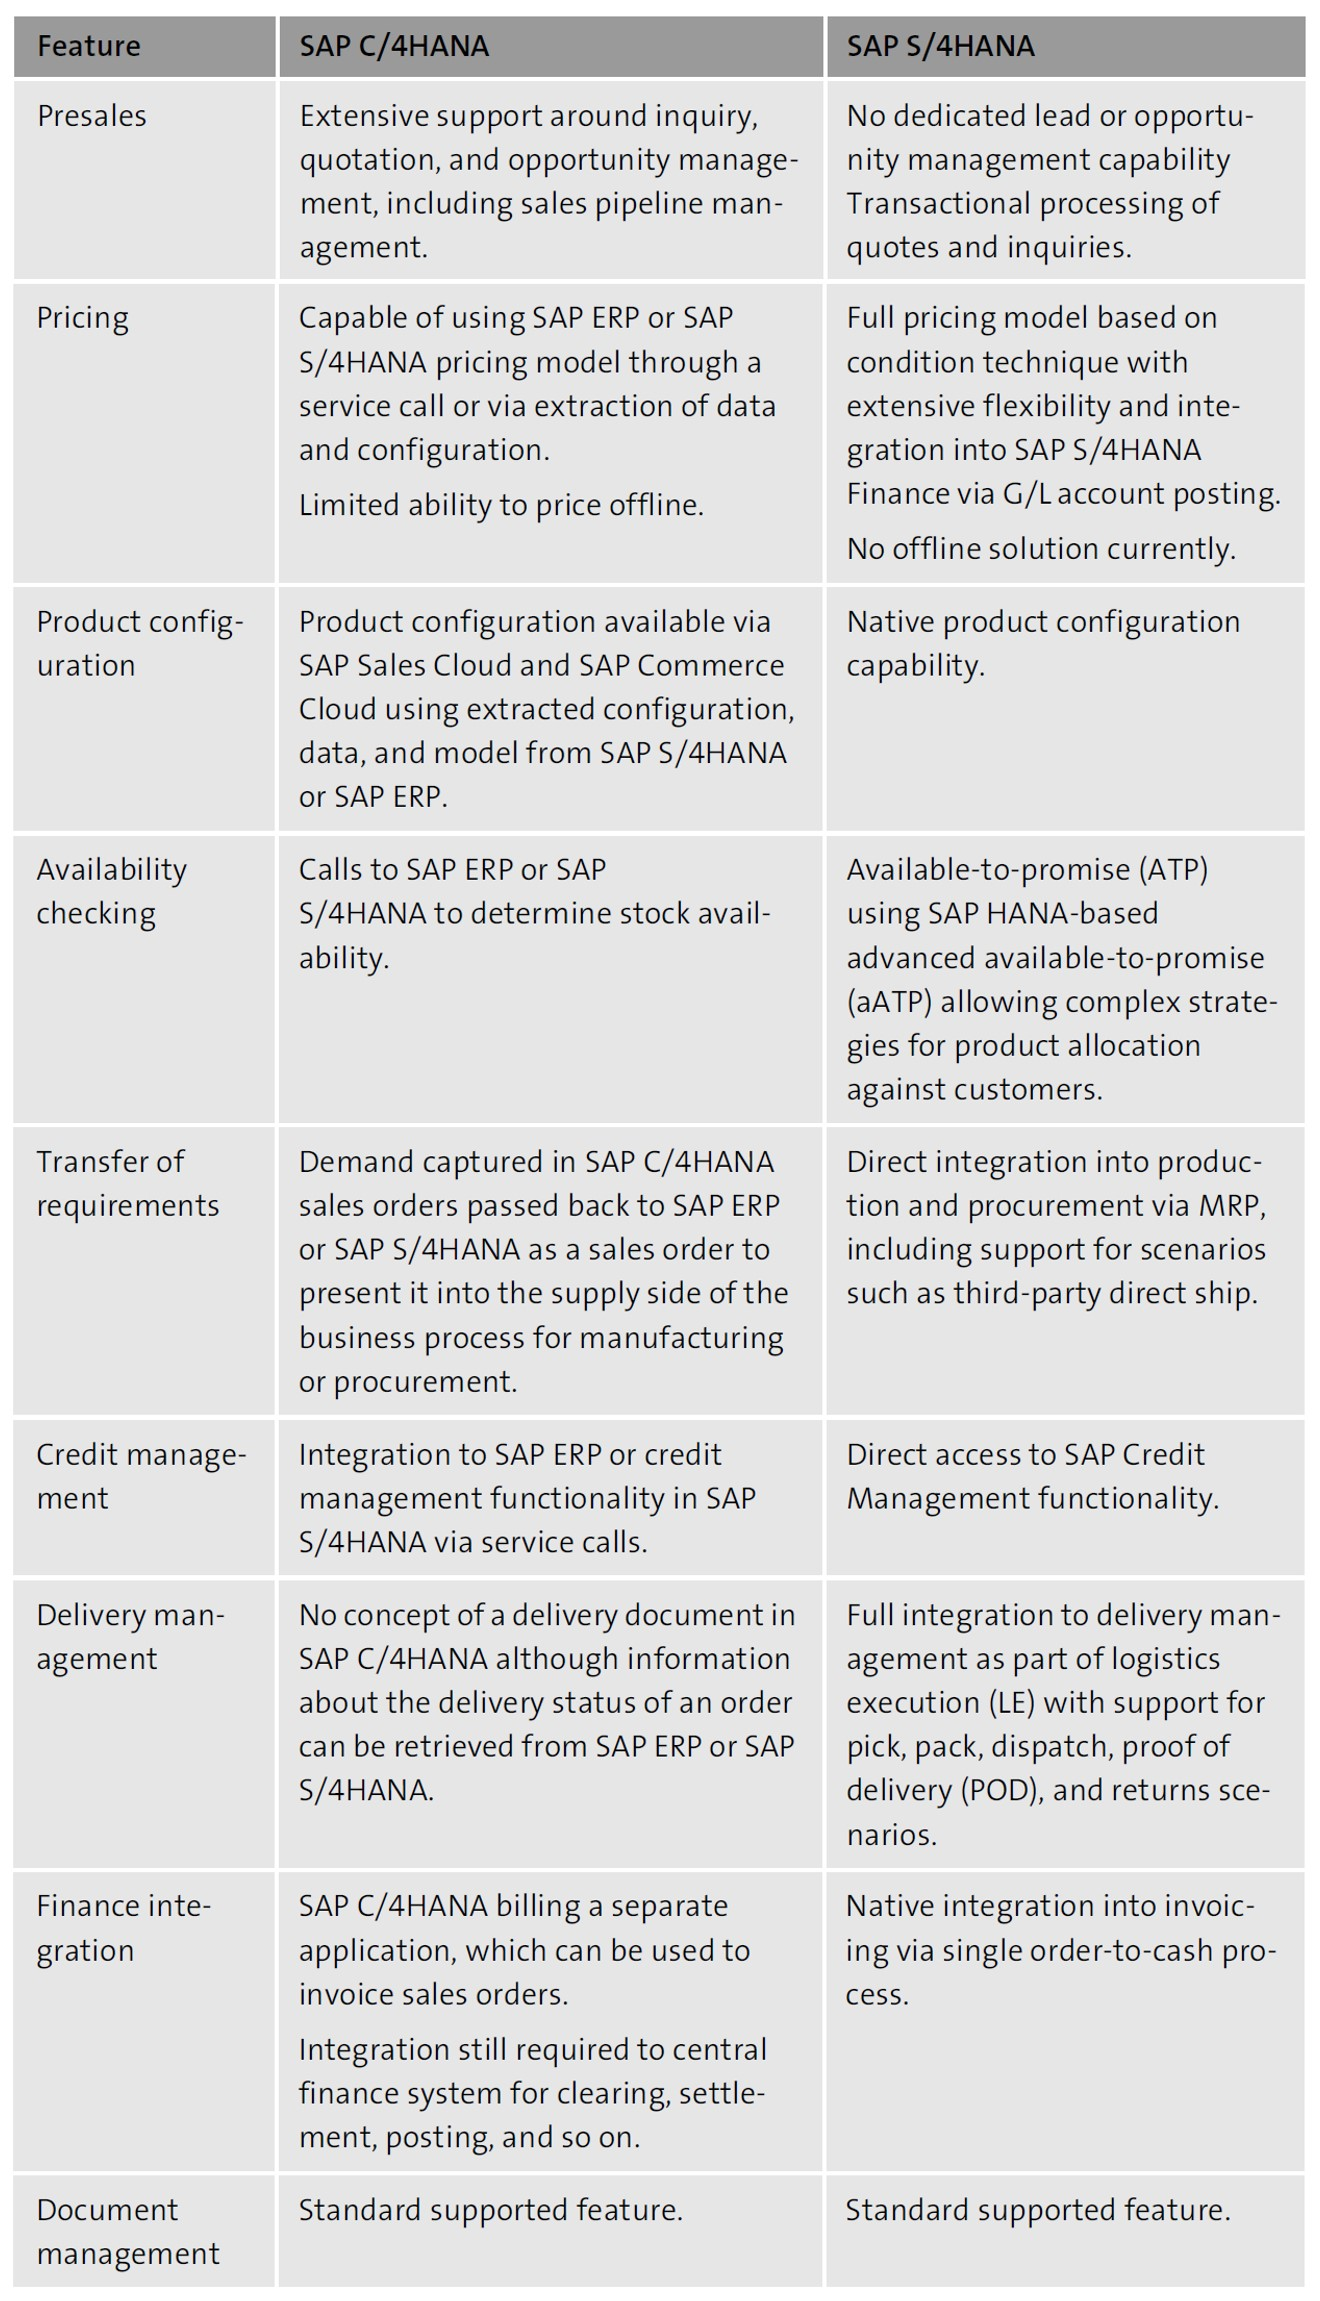 SAP C/4HANA Comparison with SAP S/4HANA